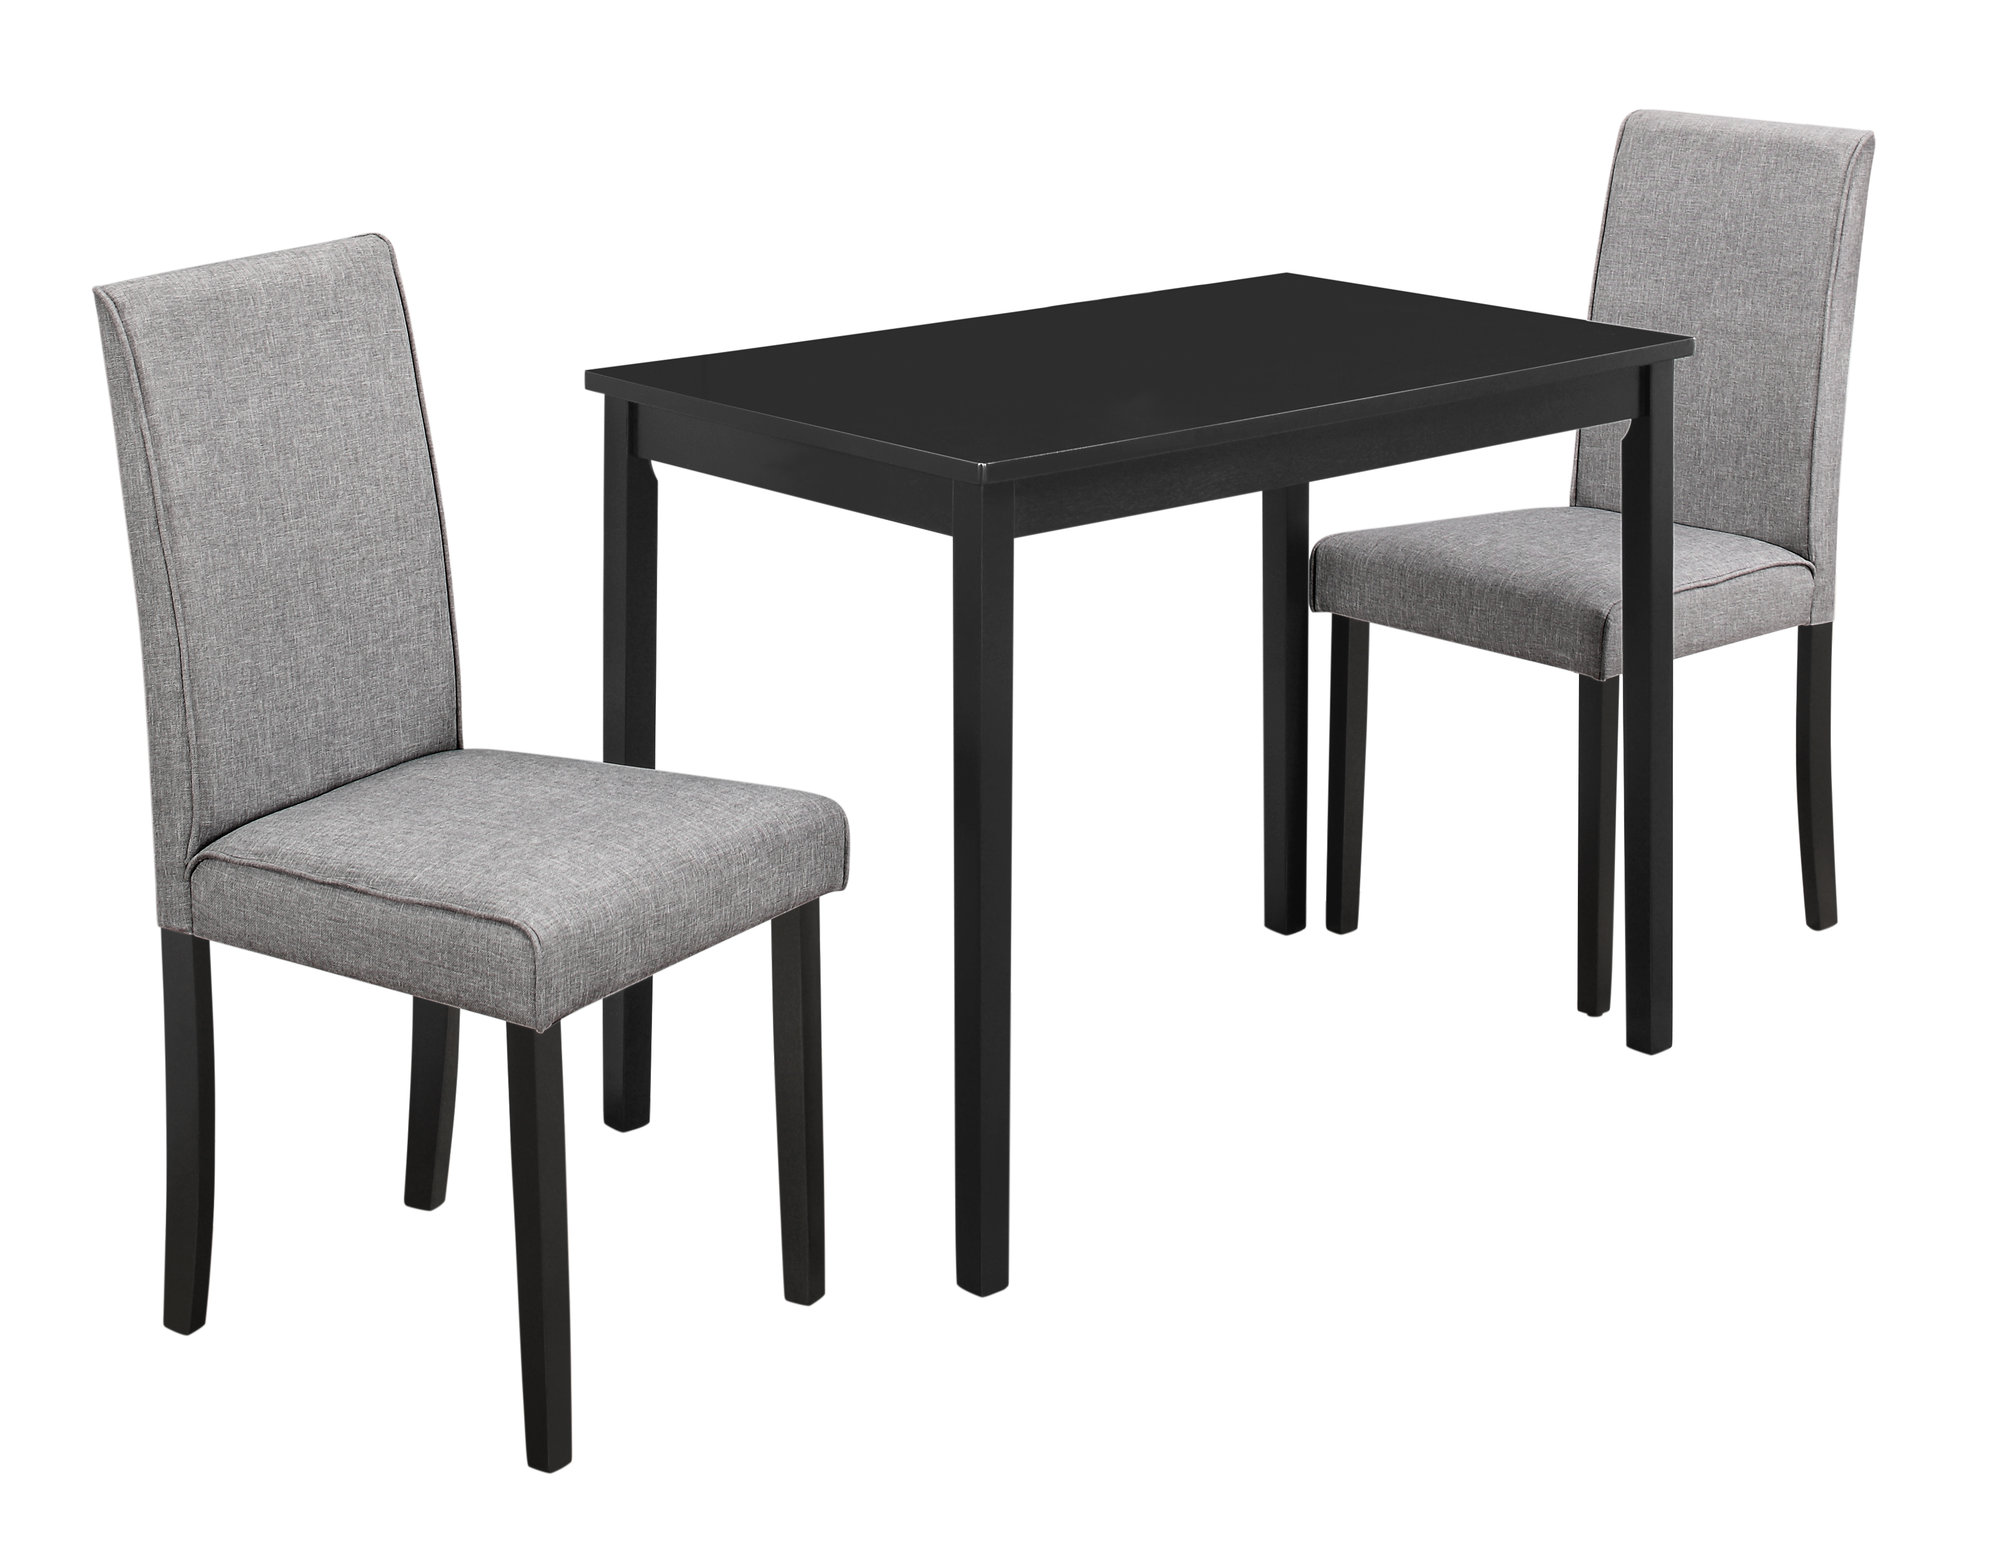 Dining Set 3pcs Set Black Grey Linen Parson Chairs